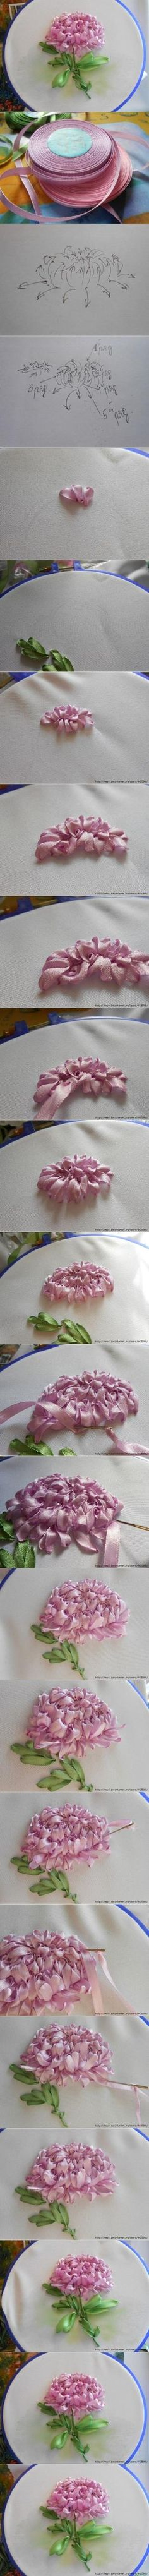 ribbon embroidery chrysanthemum tutorial by myrna                                                                                                                                                                                 More